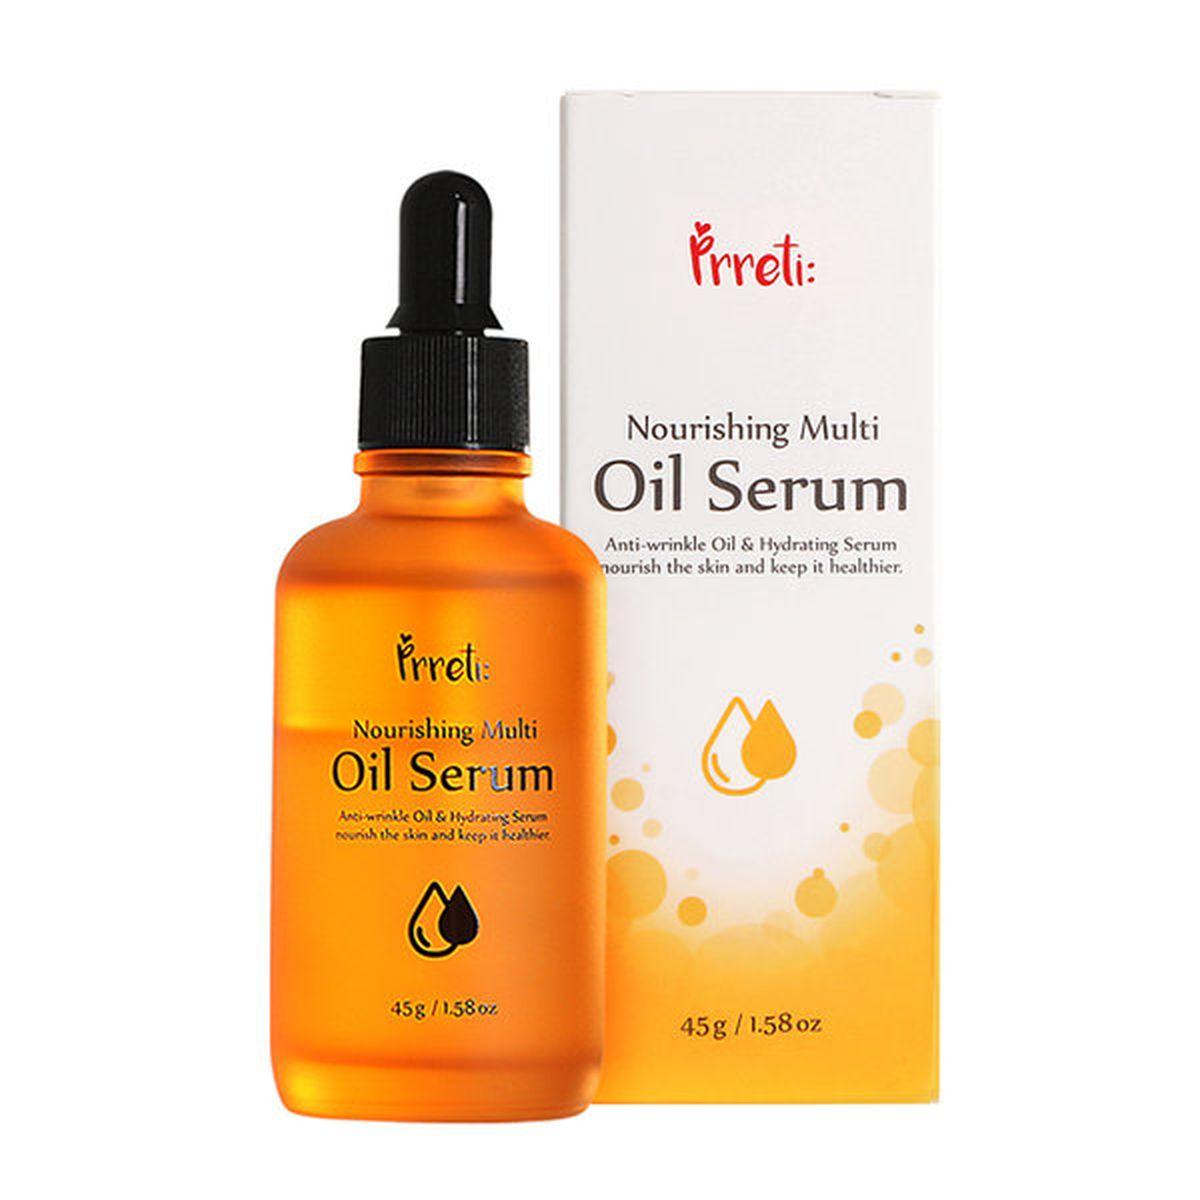 Питательная масляная сыворотка PRRETI Nourishing Multi Oil Serum - 45 мл